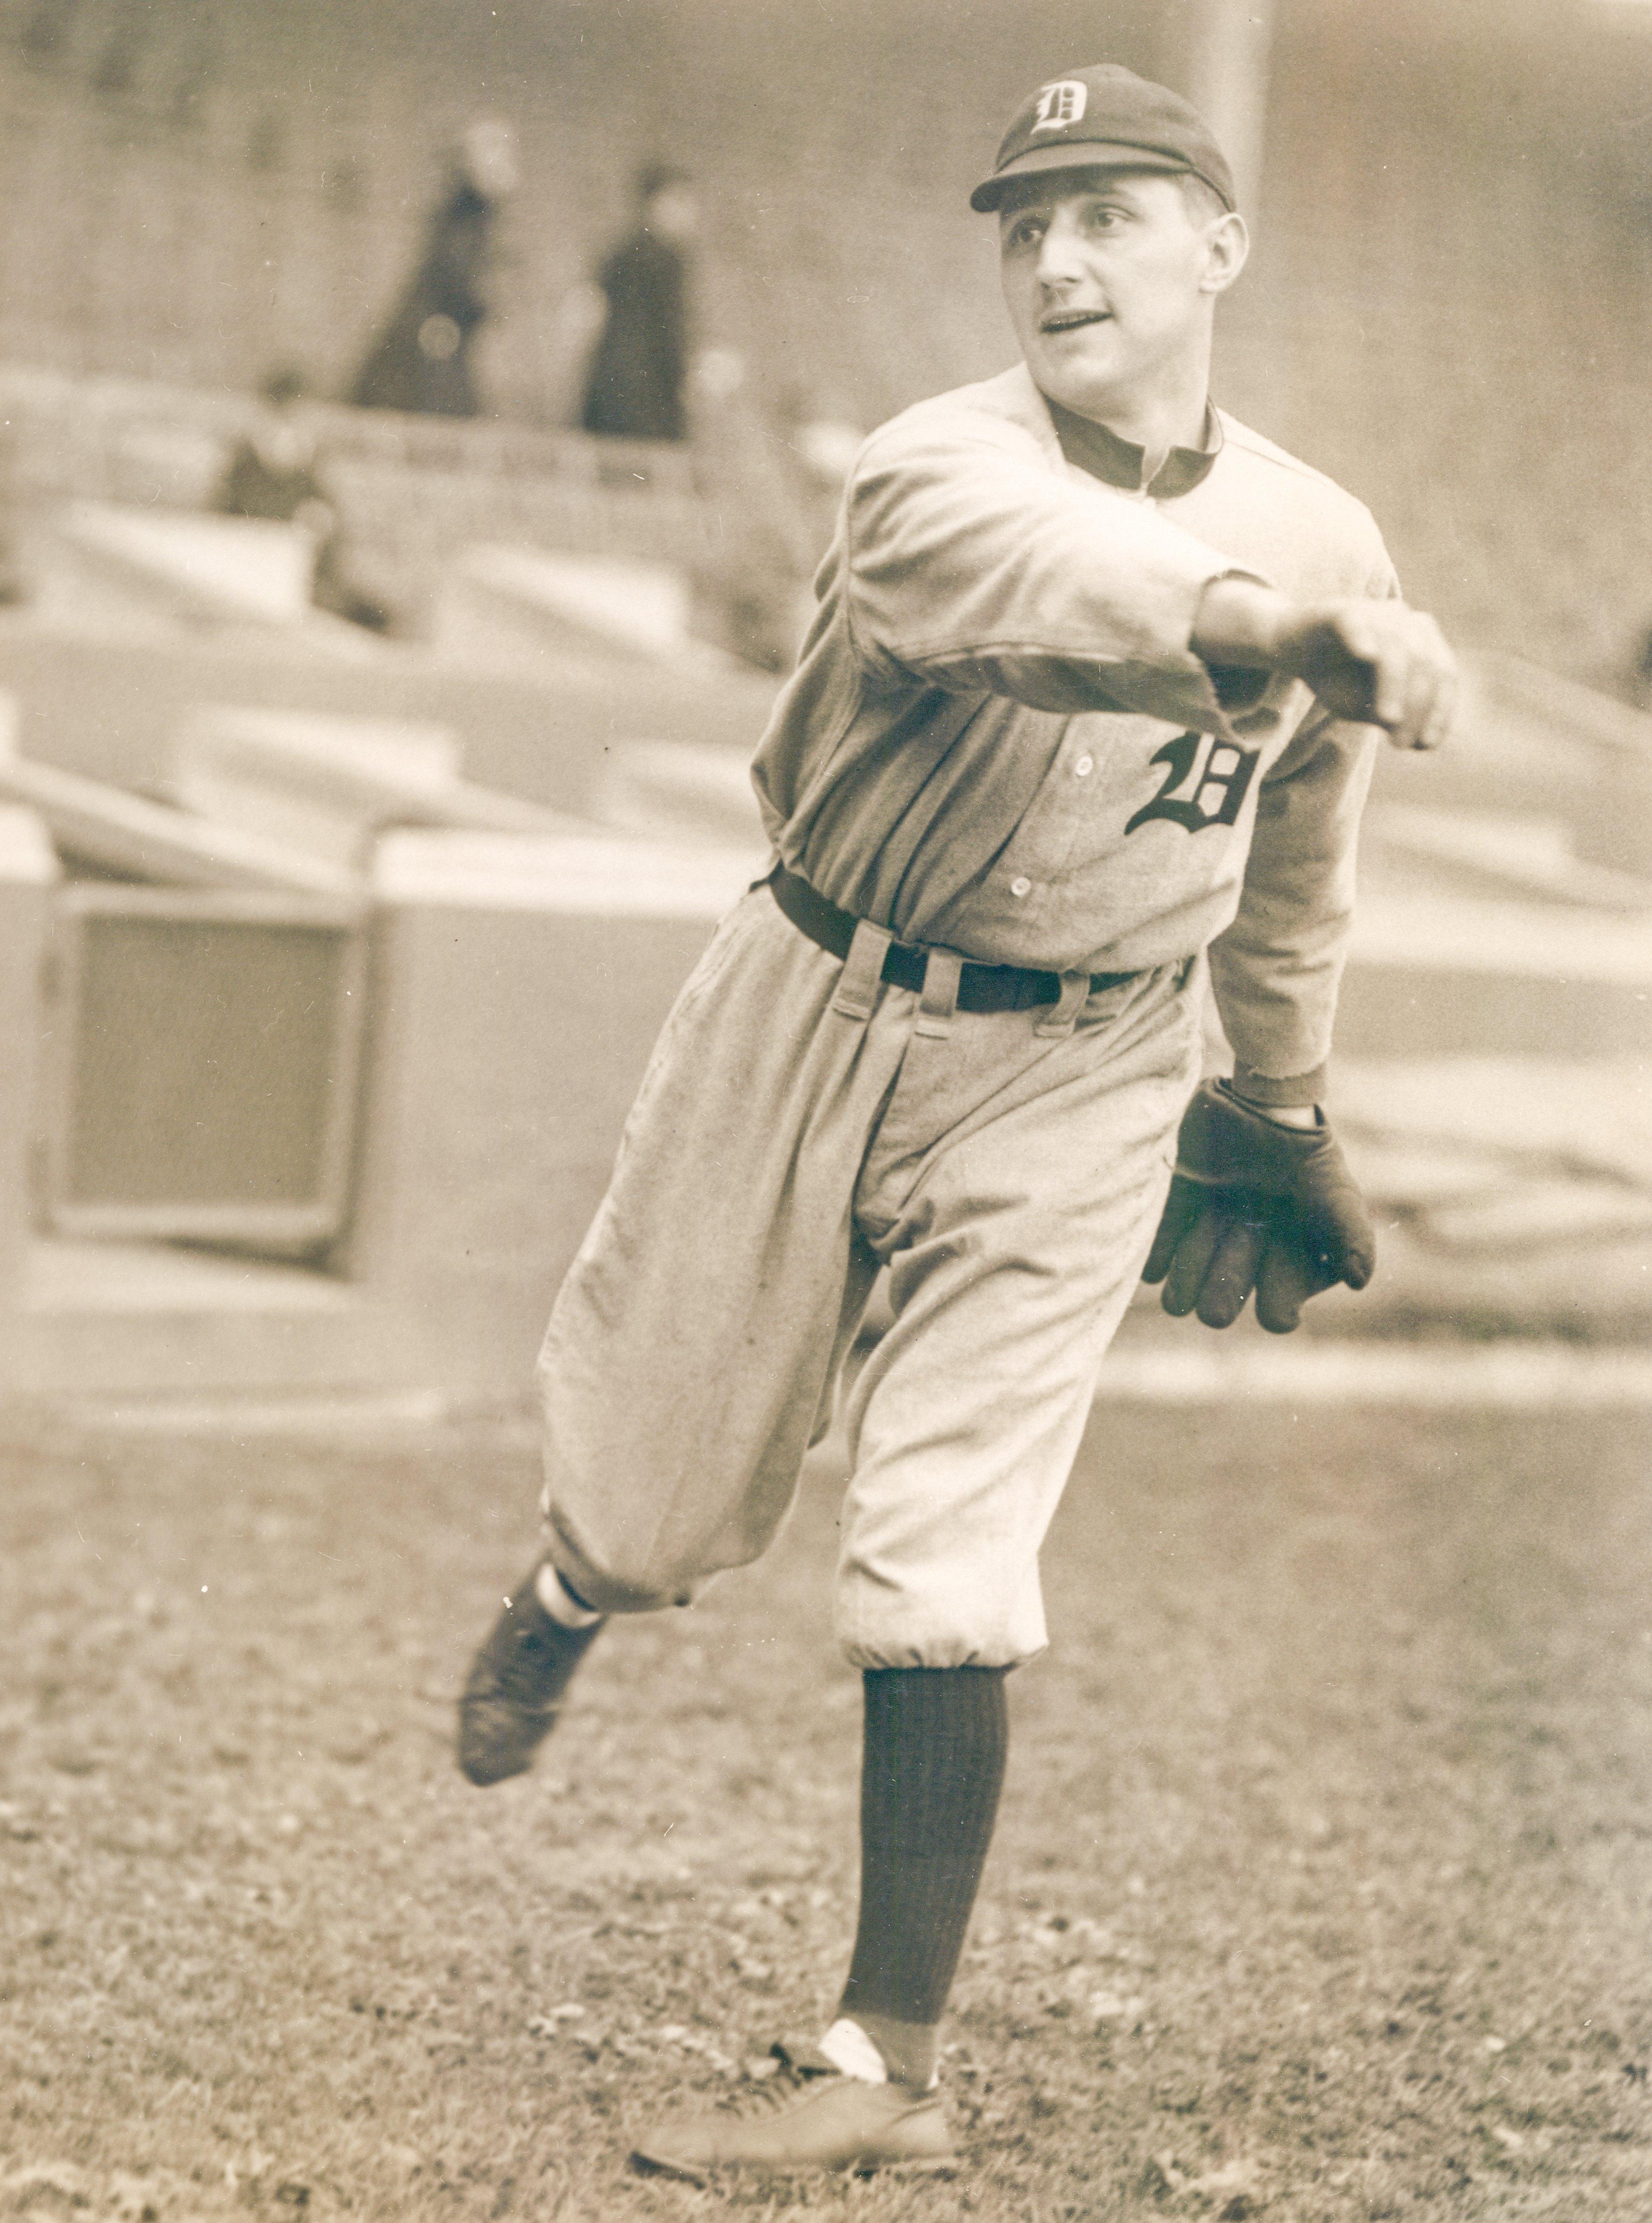 Detroit Tigers Baseball Player